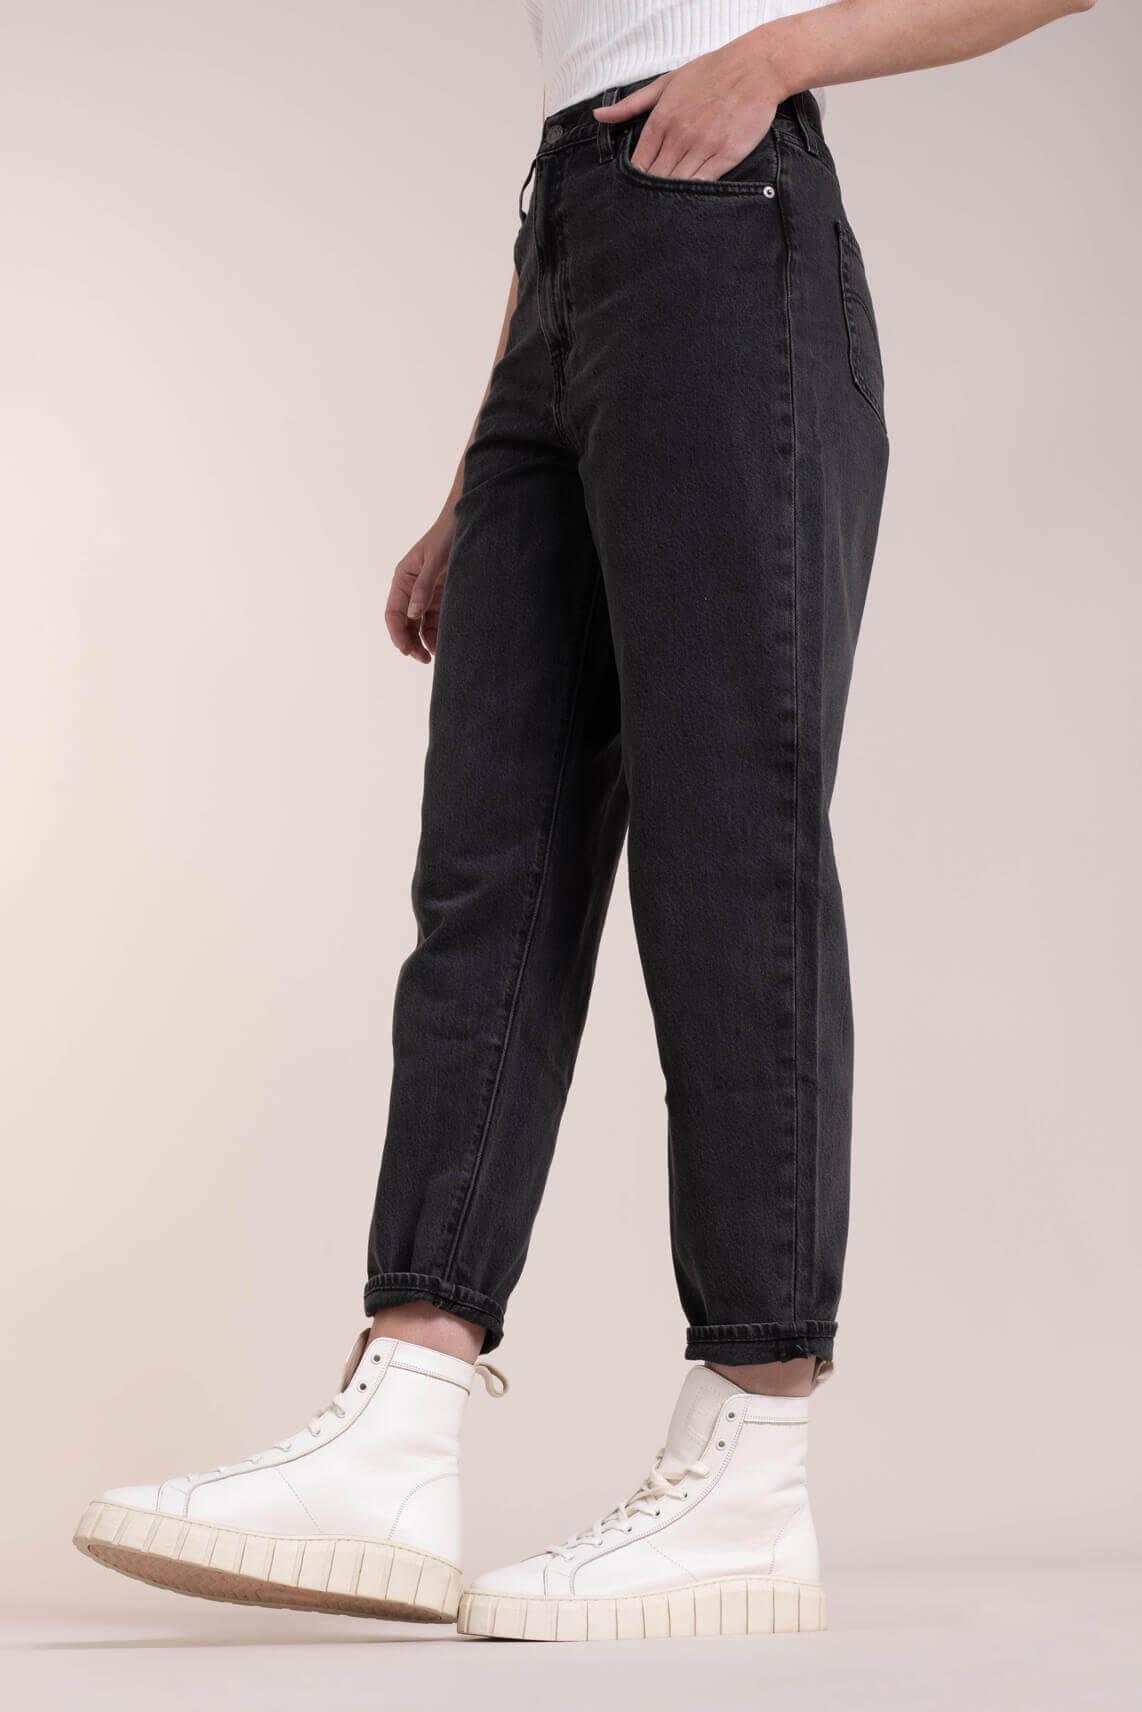 Levi's Dames High loose jeans Zwart